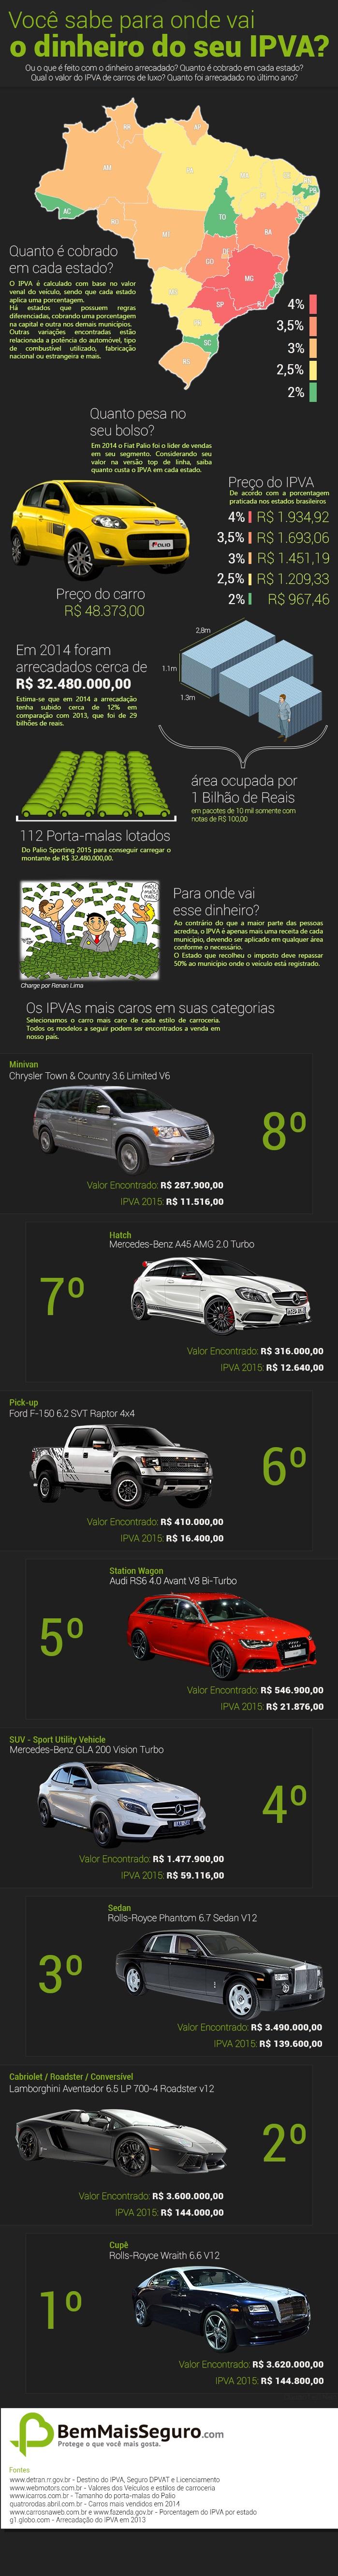 Infográfico IPVA 2015